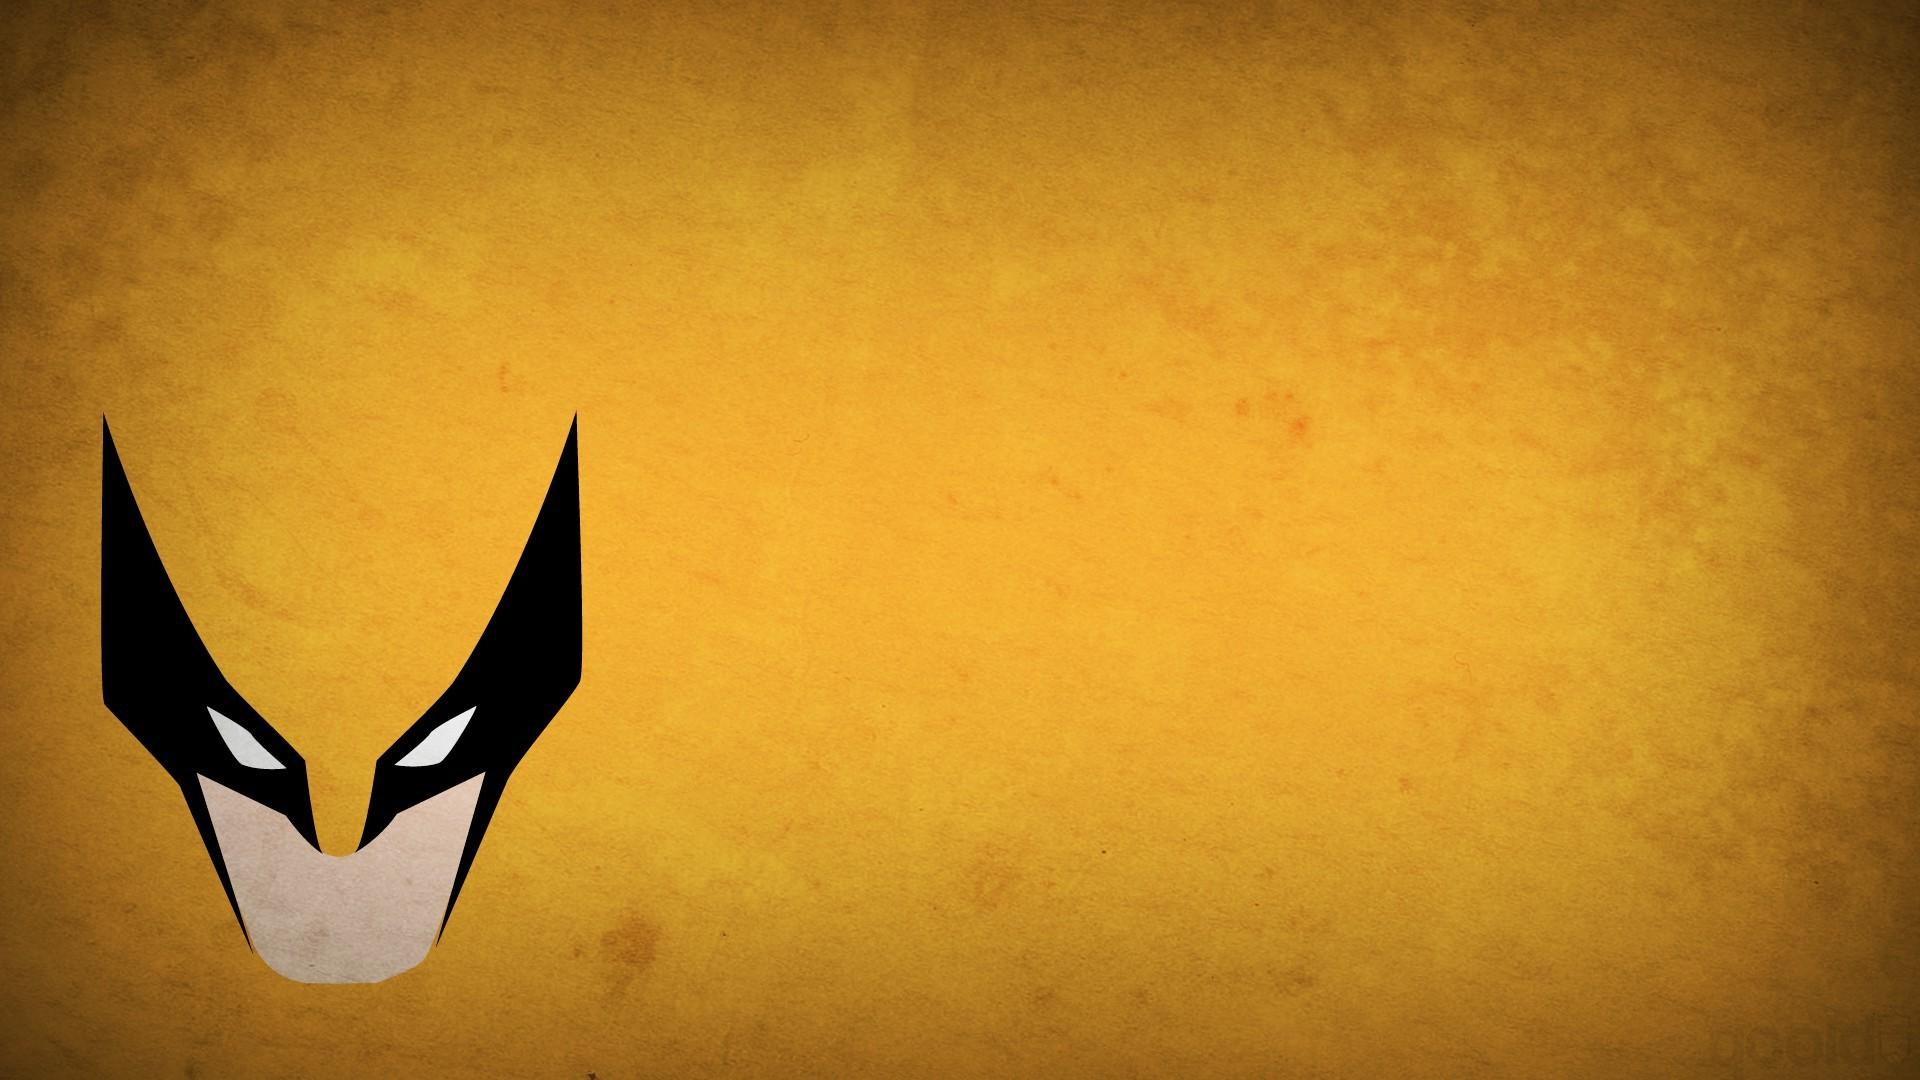 Wallpaper Sunlight Reflection Shadow Wolverine